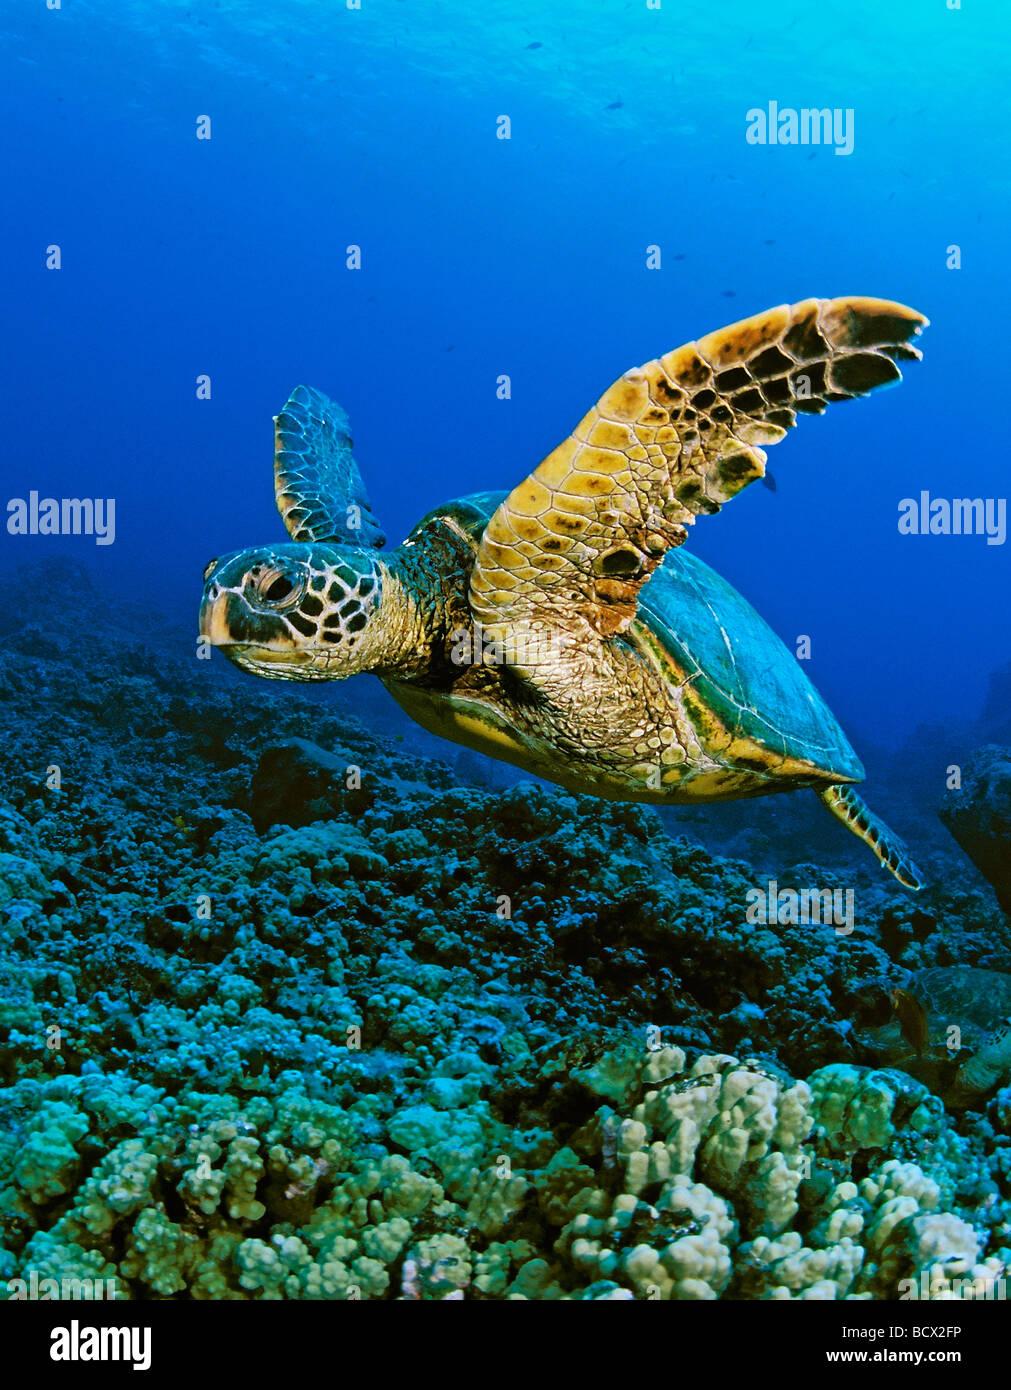 grüne Meeresschildkröte, Chelonia Mydas, Hawaii, USA, Kona, Big Island, Pazifik Stockbild